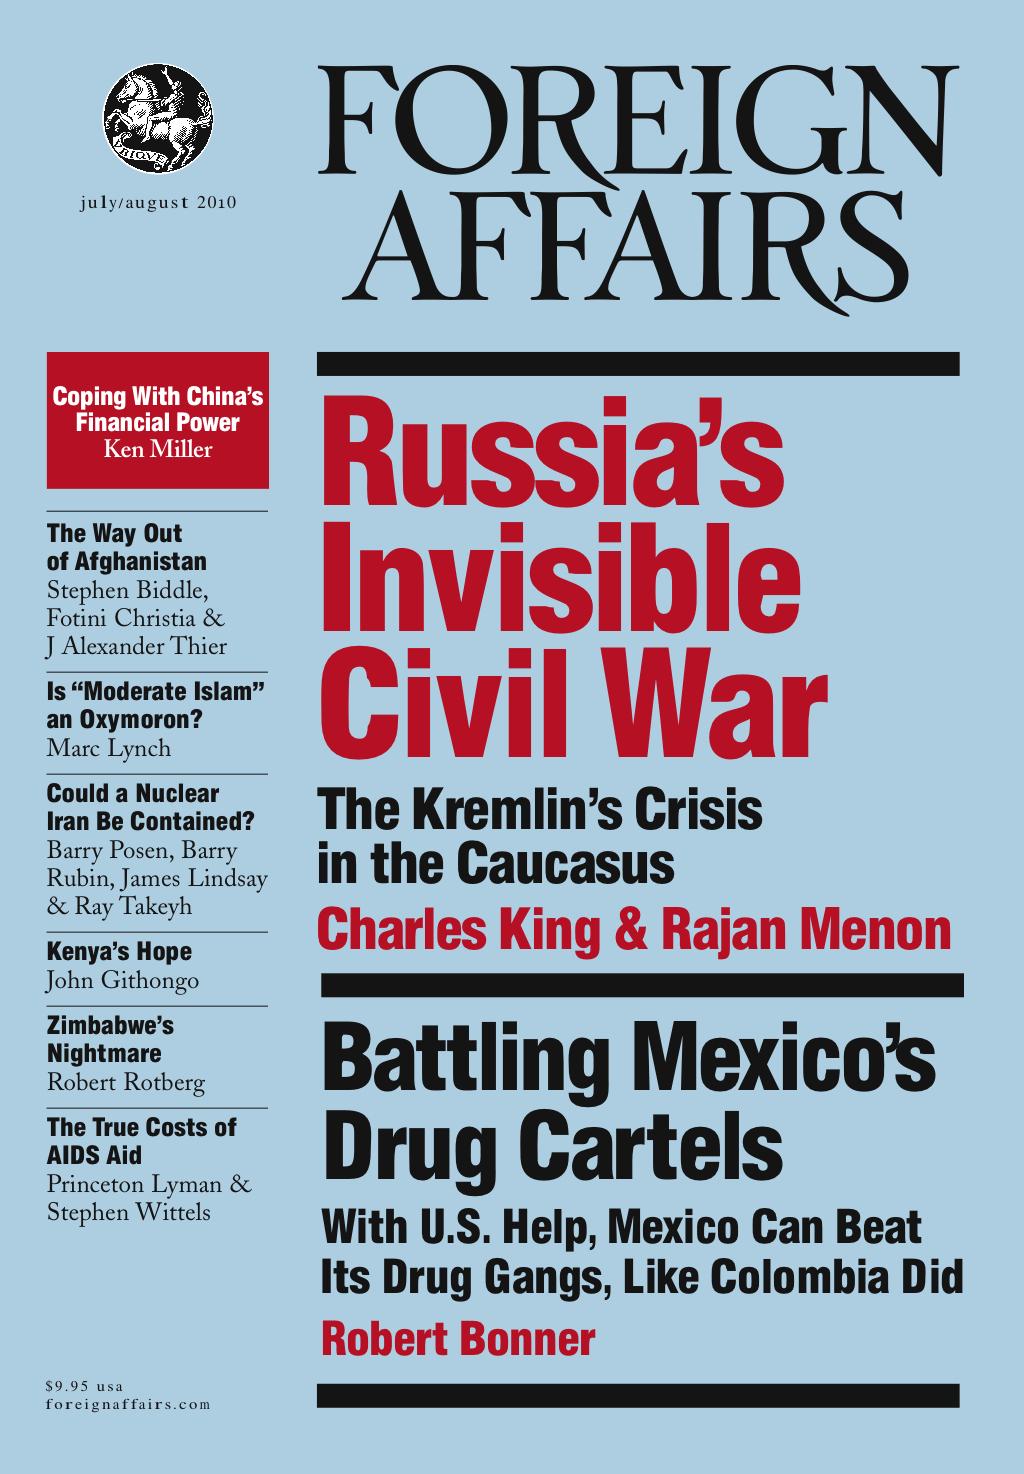 Foreign_Affairs.jpg